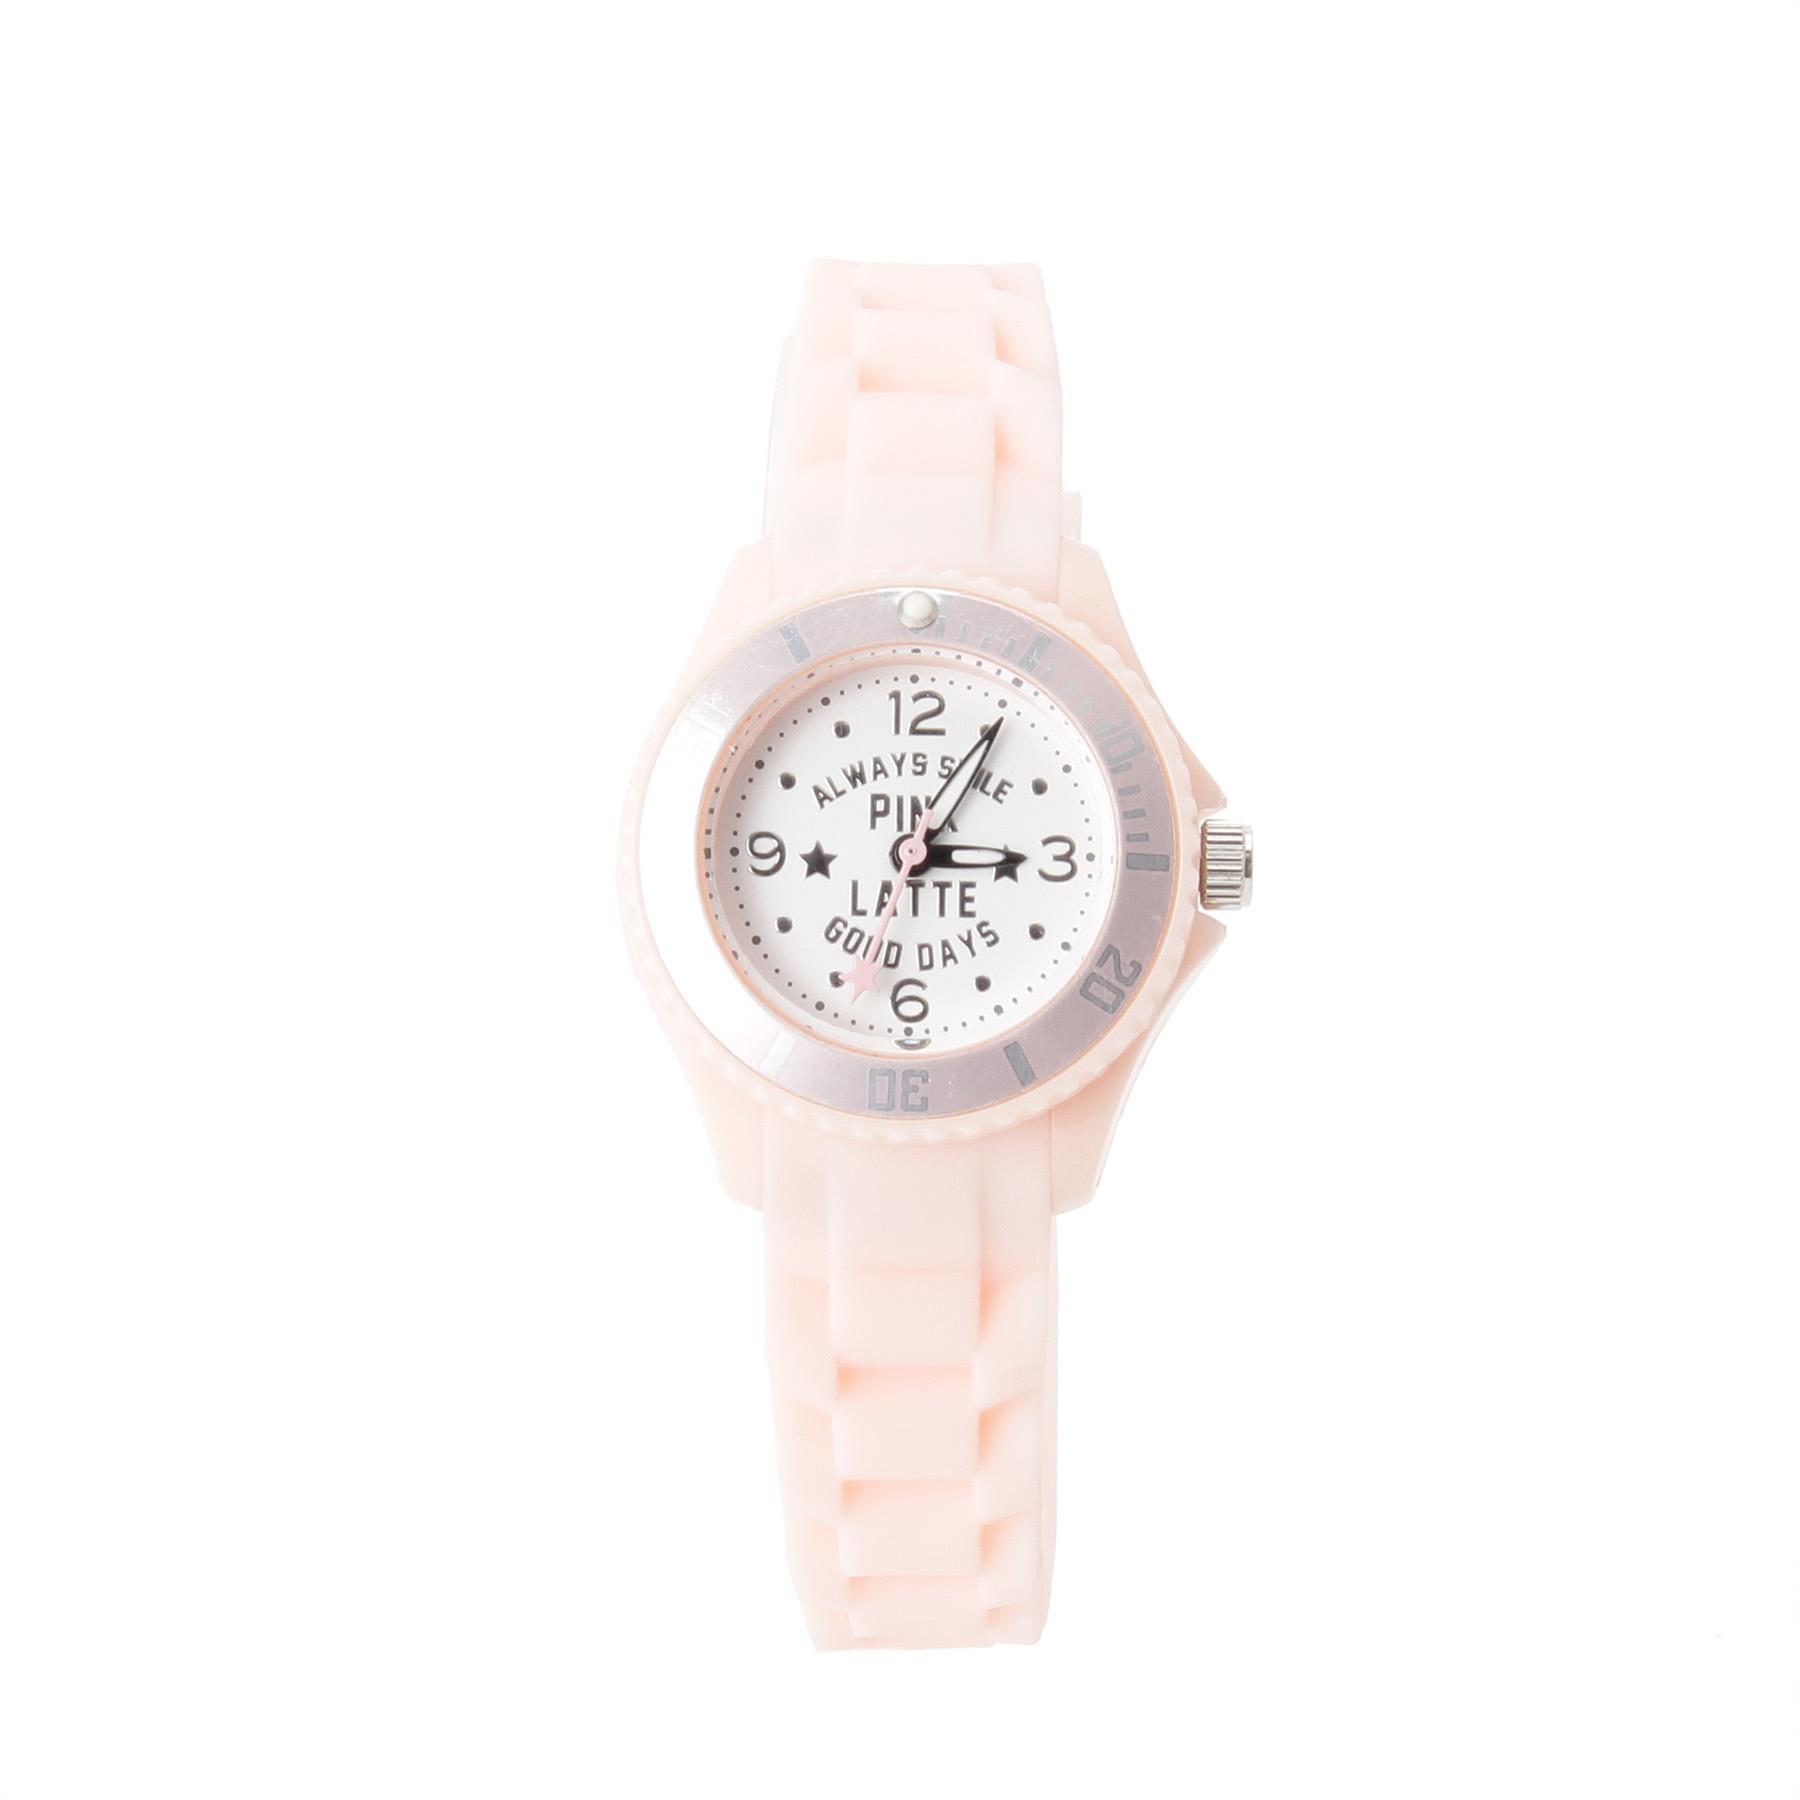 【PINK-latte (ピンク ラテ)】ラバーウォッチ(スター)ティーンズ 雑貨 腕時計 ベビーピンク